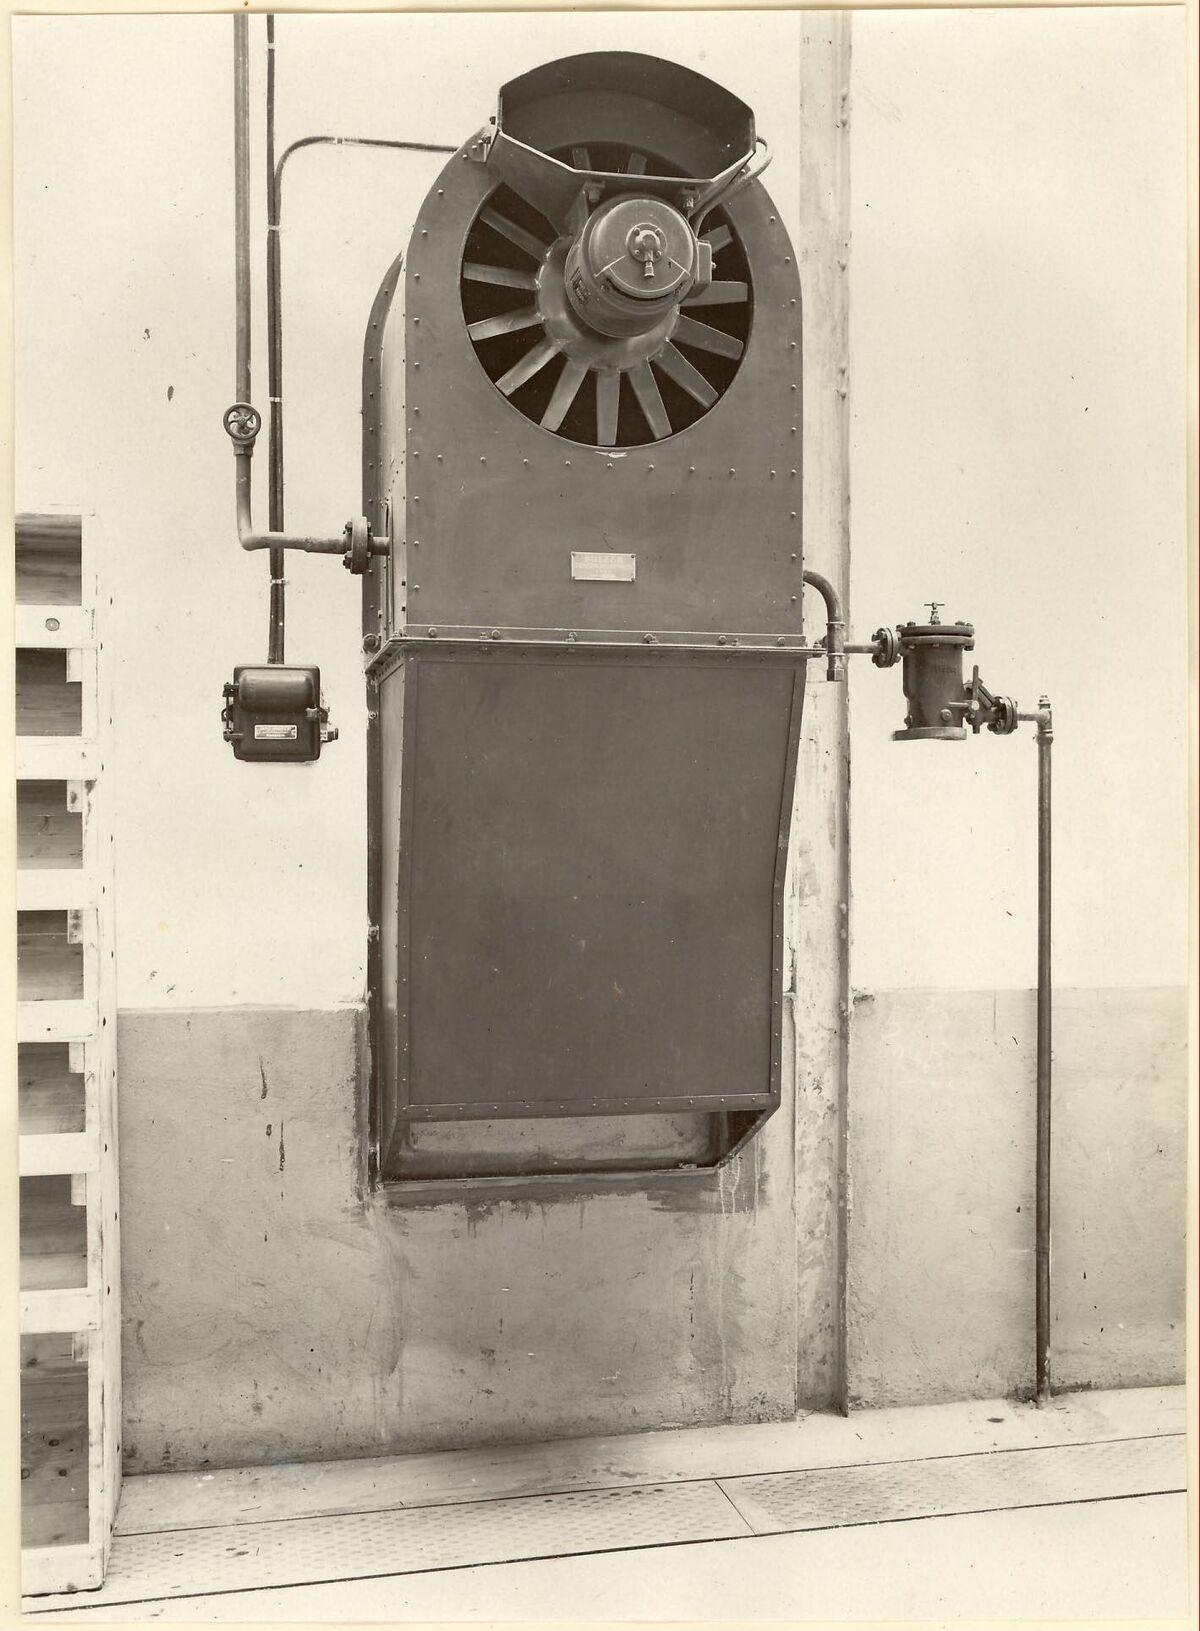 GFA 24/53.1155: Ventilation shaft